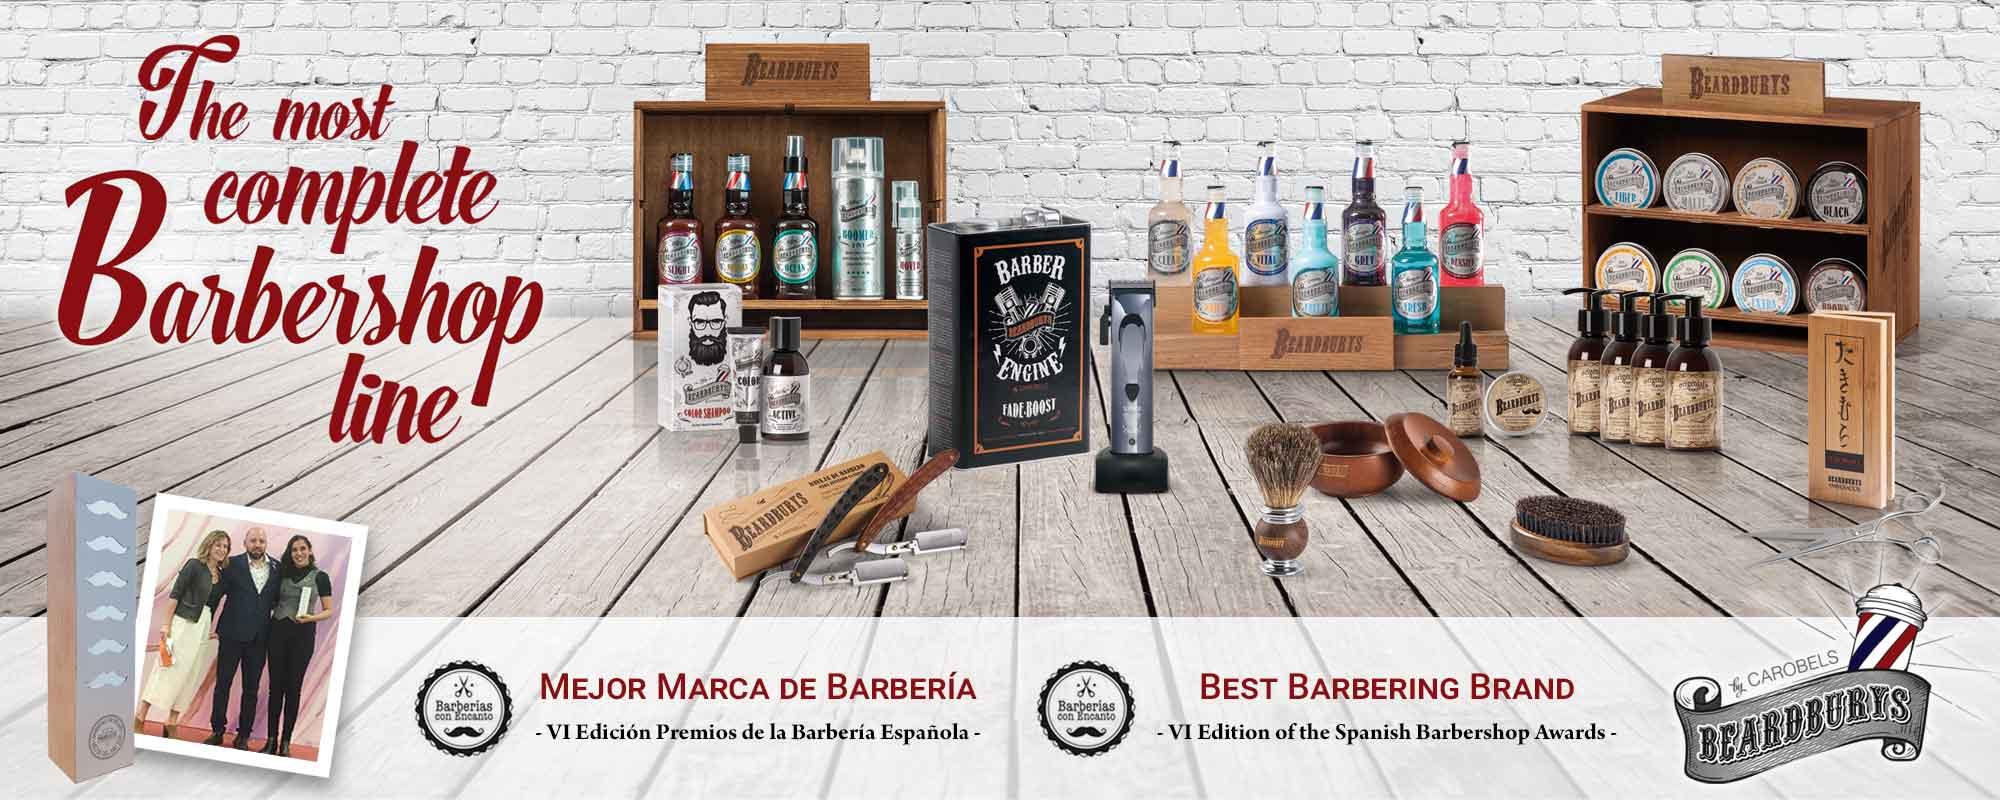 Beardburys choosen as Best Barbering Brand